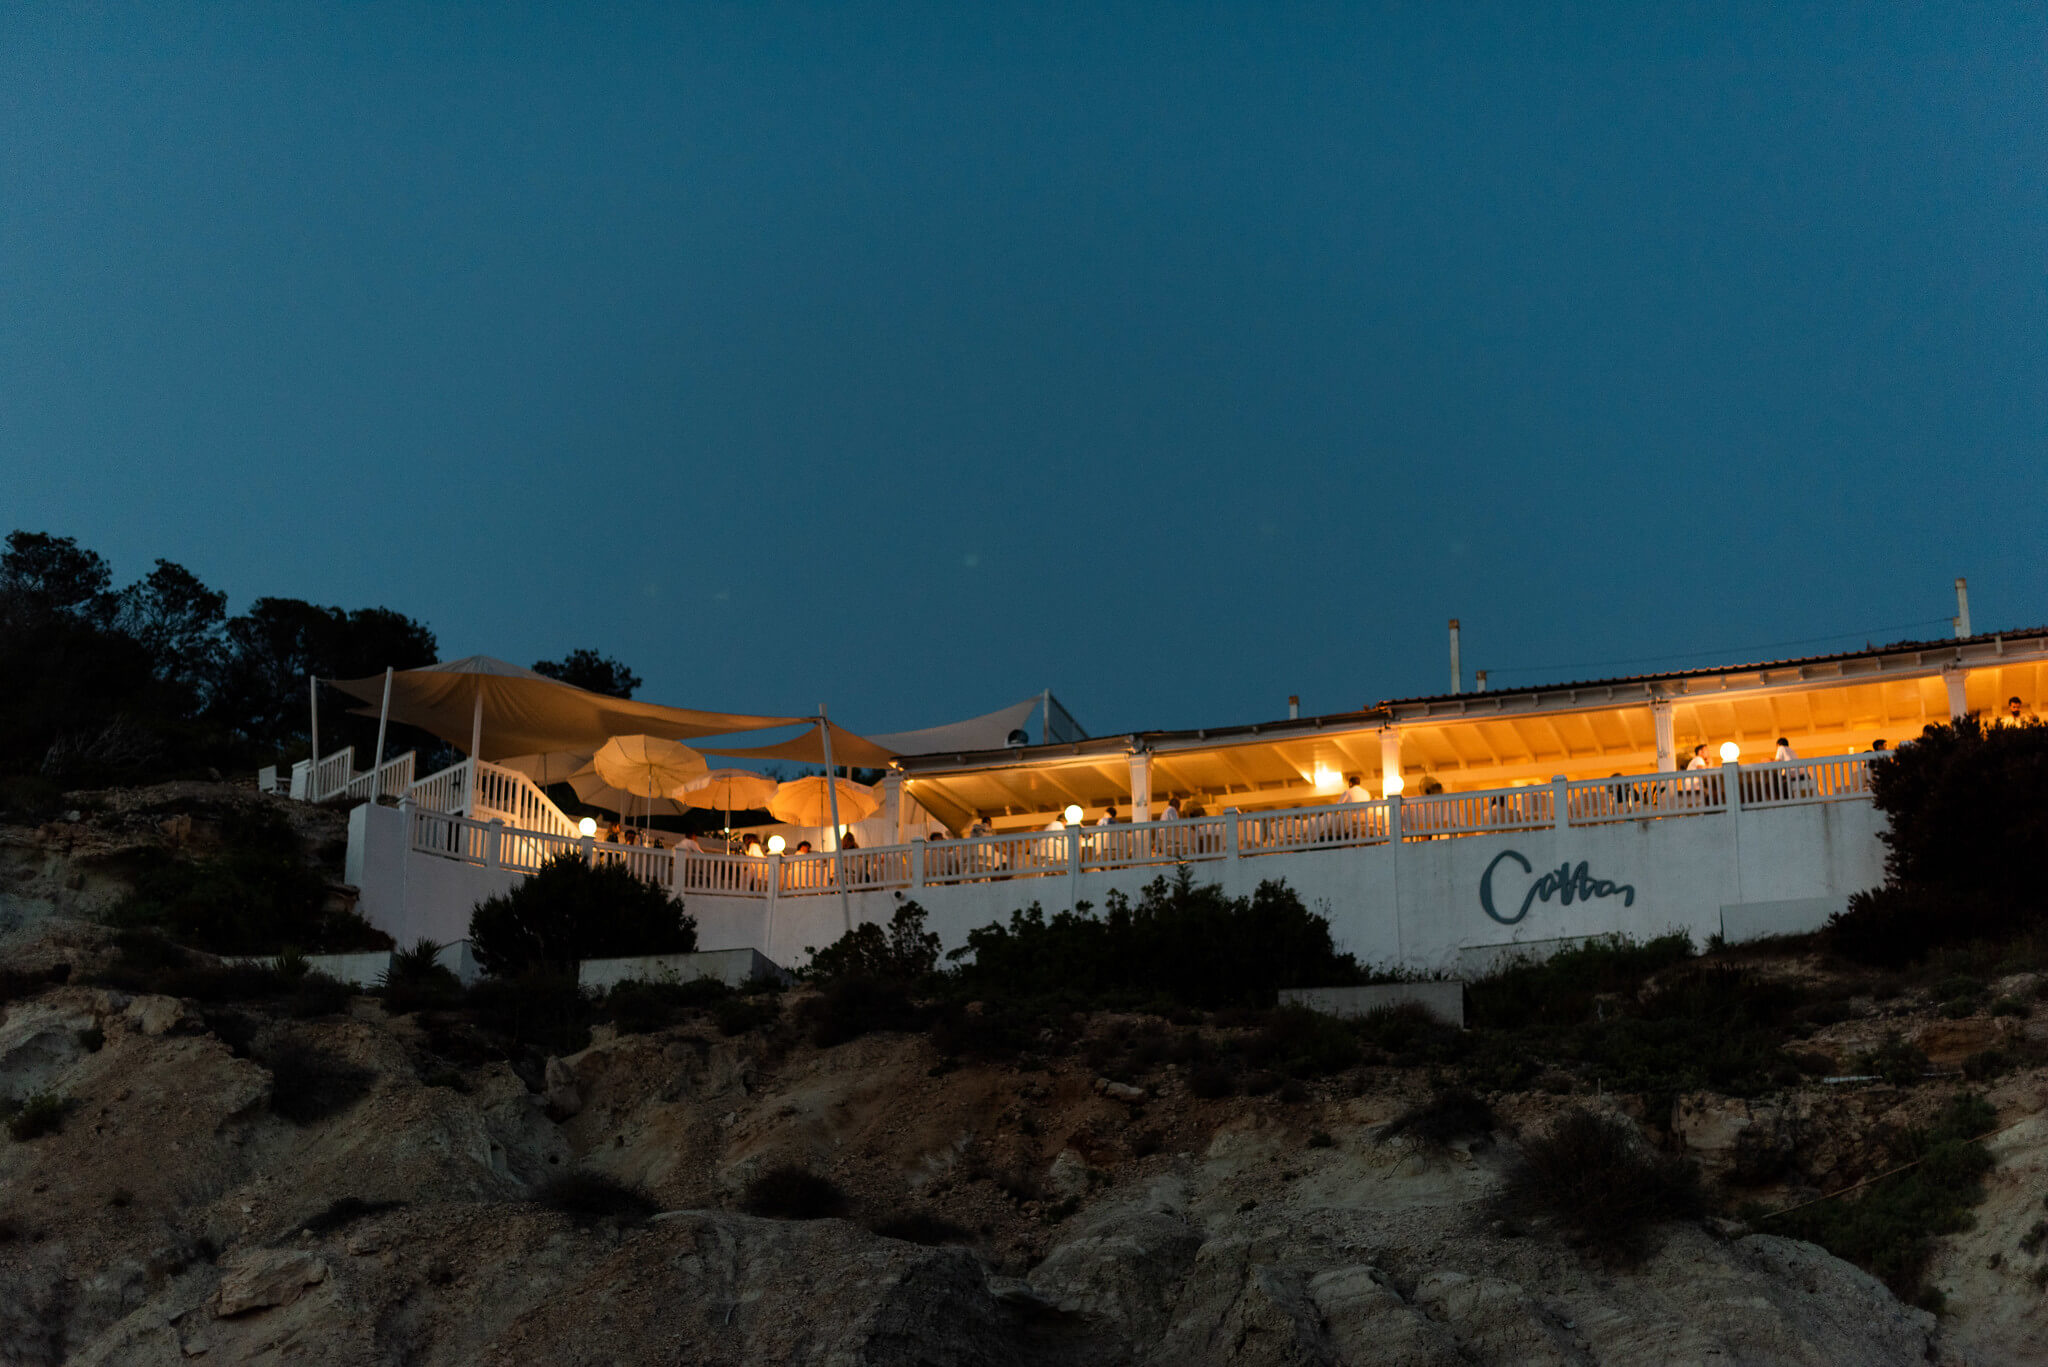 https://www.white-ibiza.com/wp-content/uploads/2020/03/ibiza-beach-restaurant-cotton-beach-club-2020-09.jpg